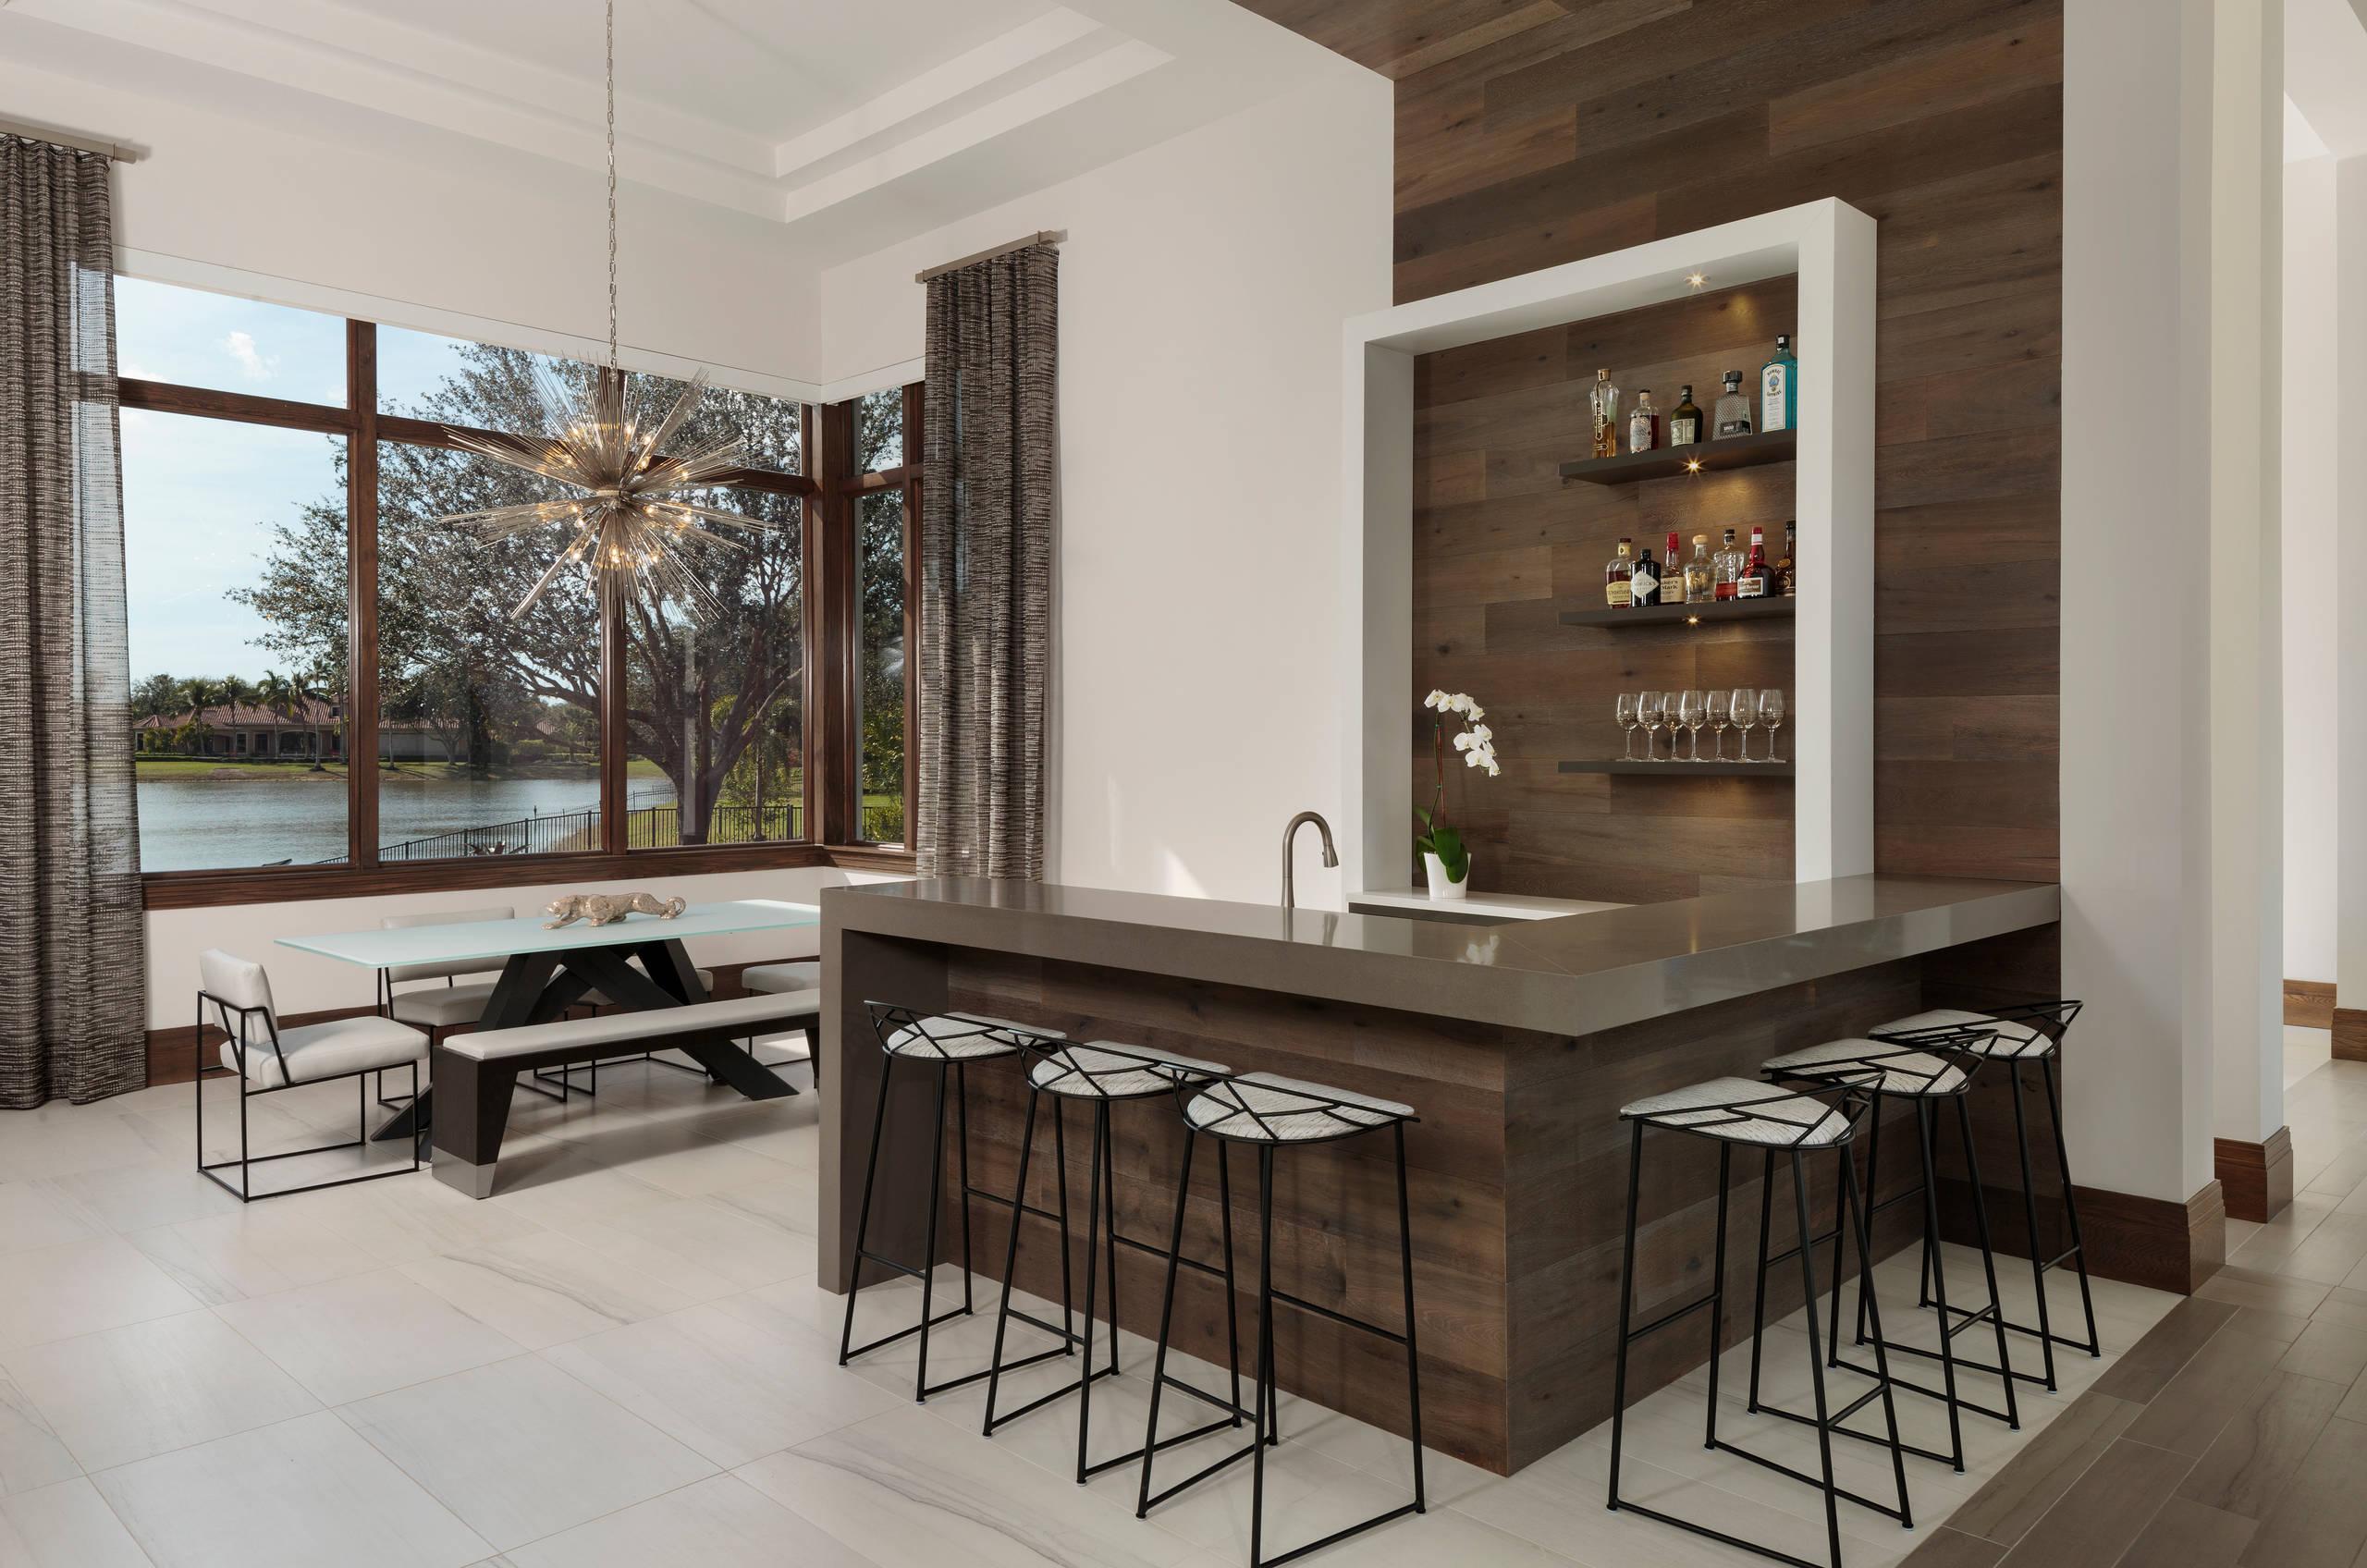 75 Beautiful Modern Home Bar Pictures Ideas November 2020 Houzz